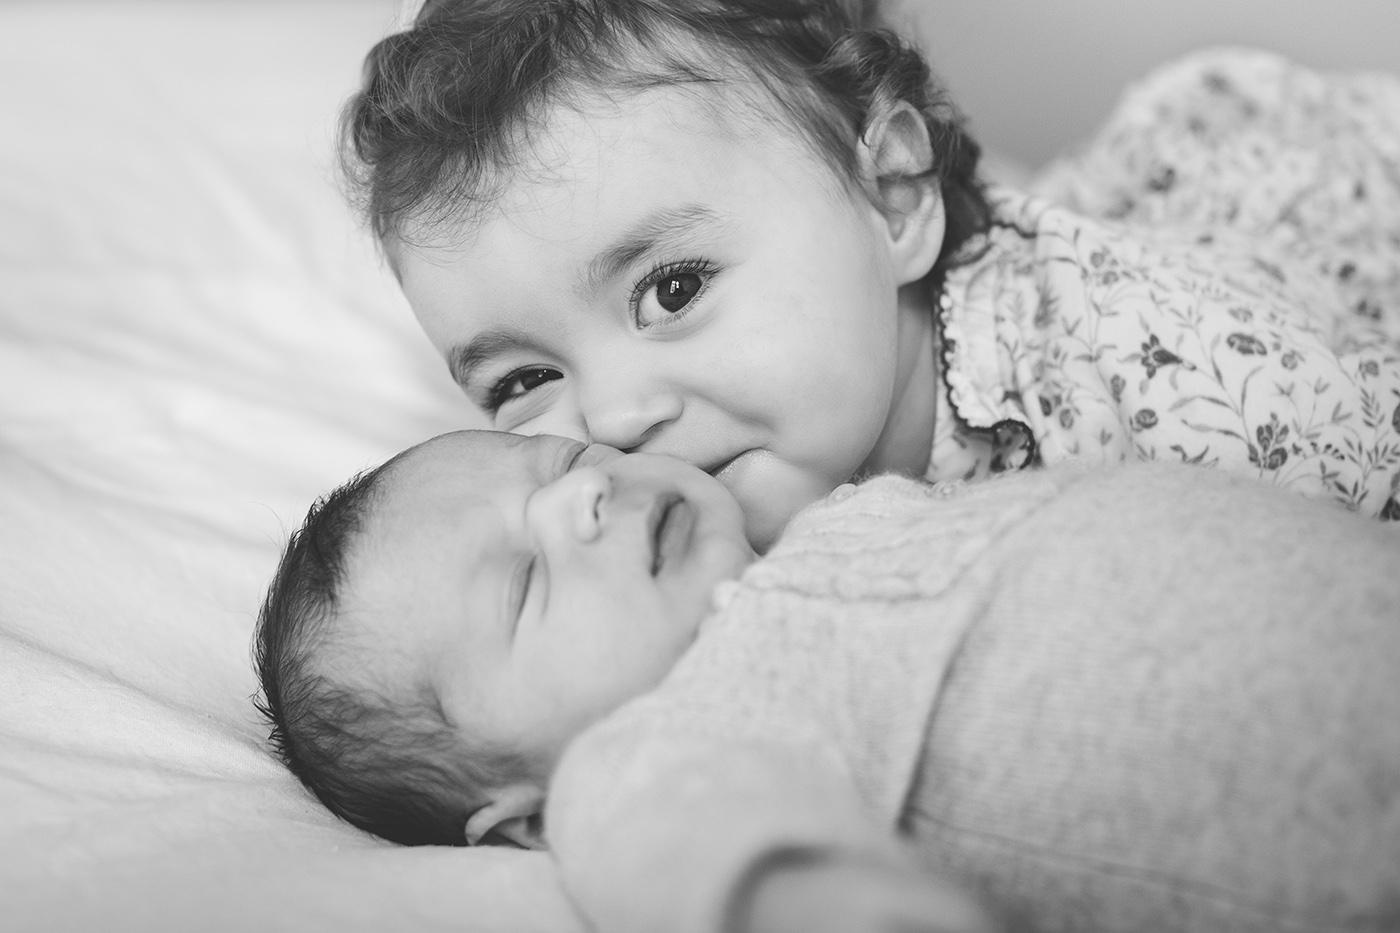 photographe-naissance-maternite-enfant-bebe-poitiers-guillaume-heraud-11